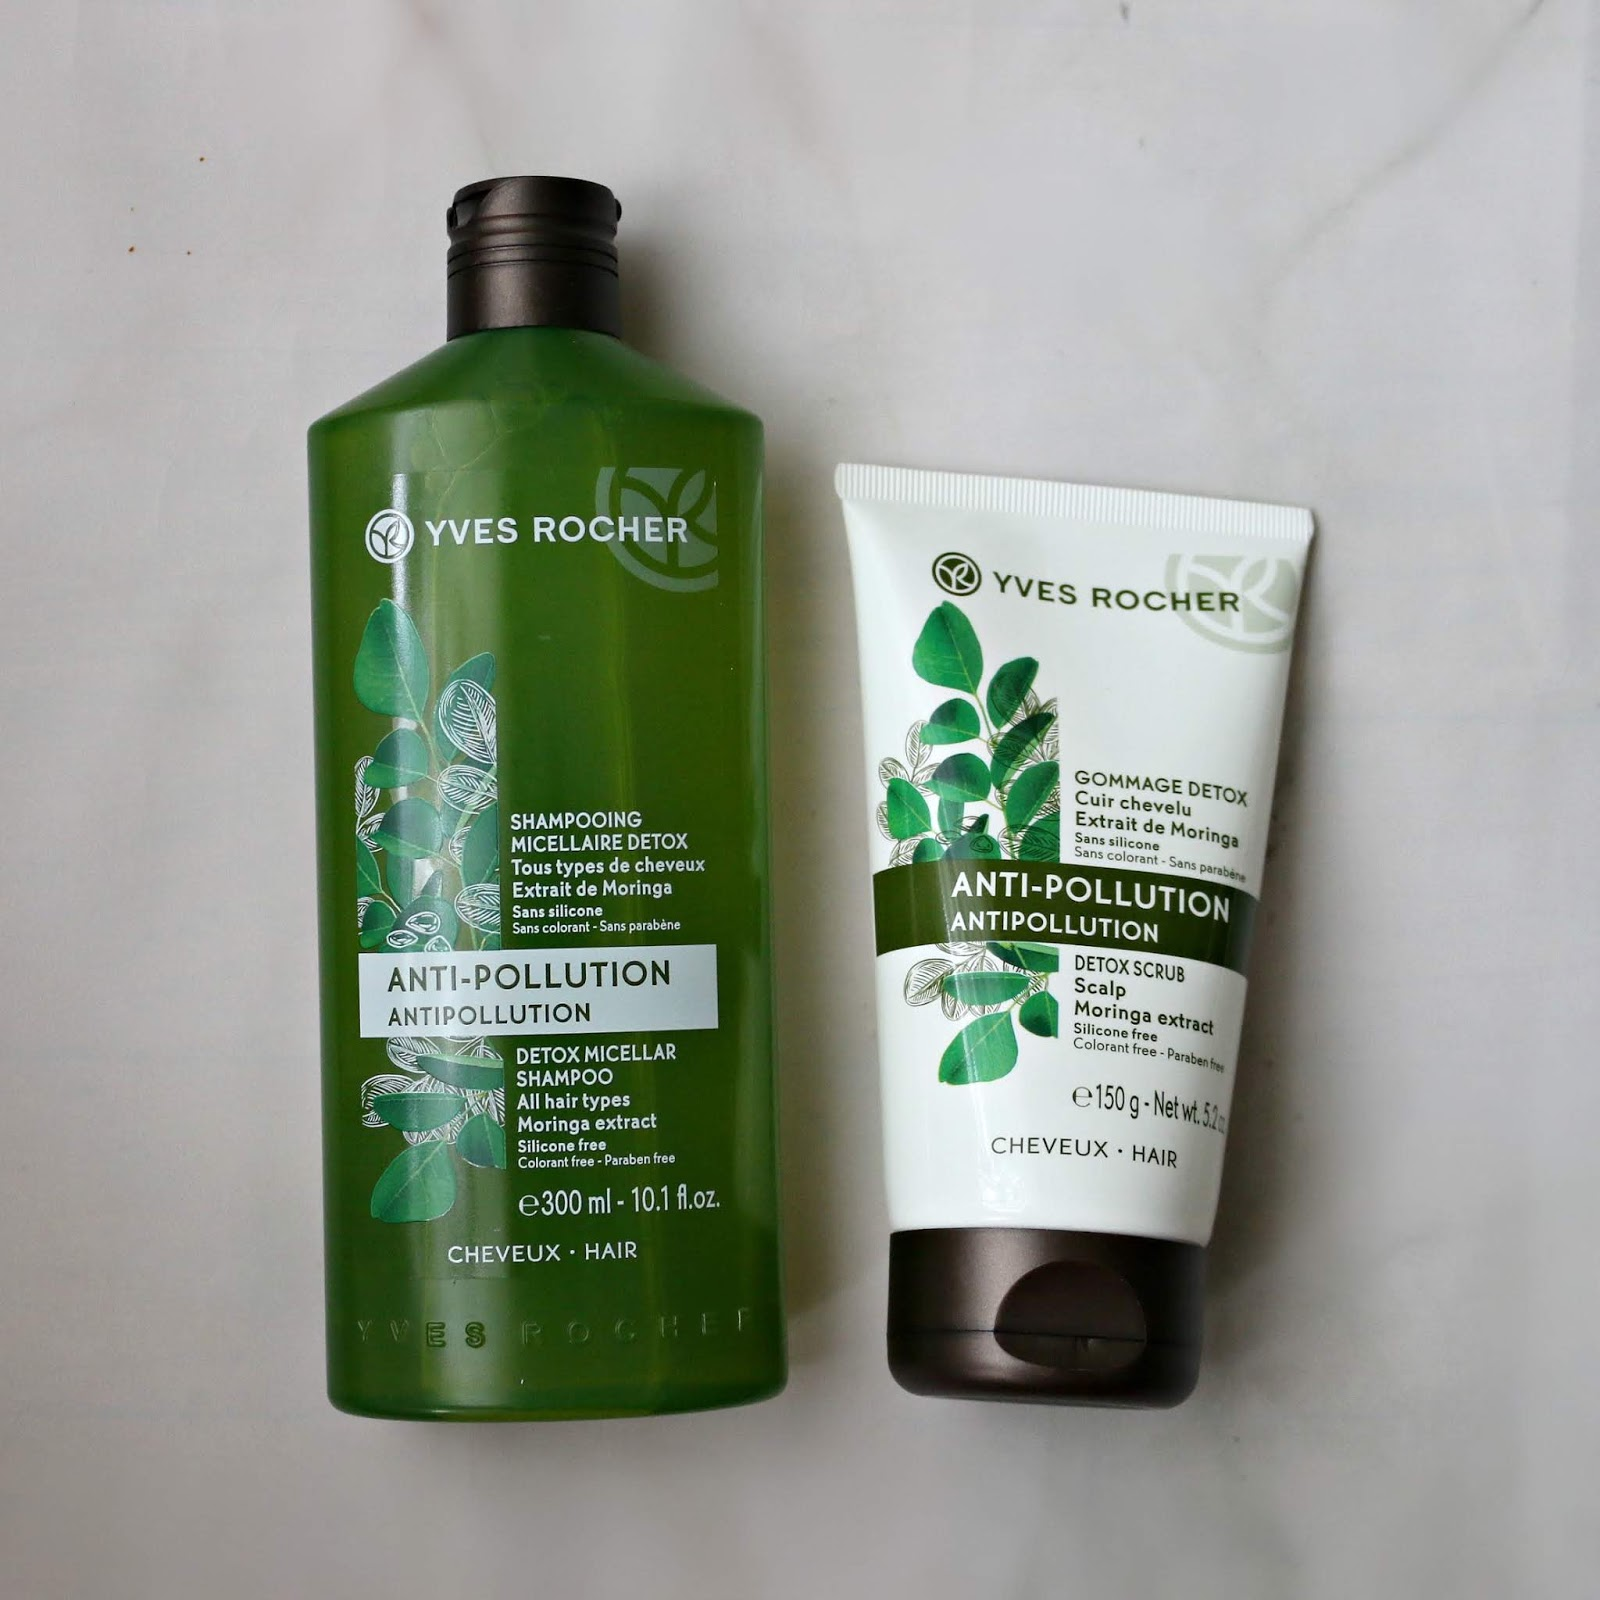 Yves Rocher Antipollution Detox Micellar Shampoo Scrub